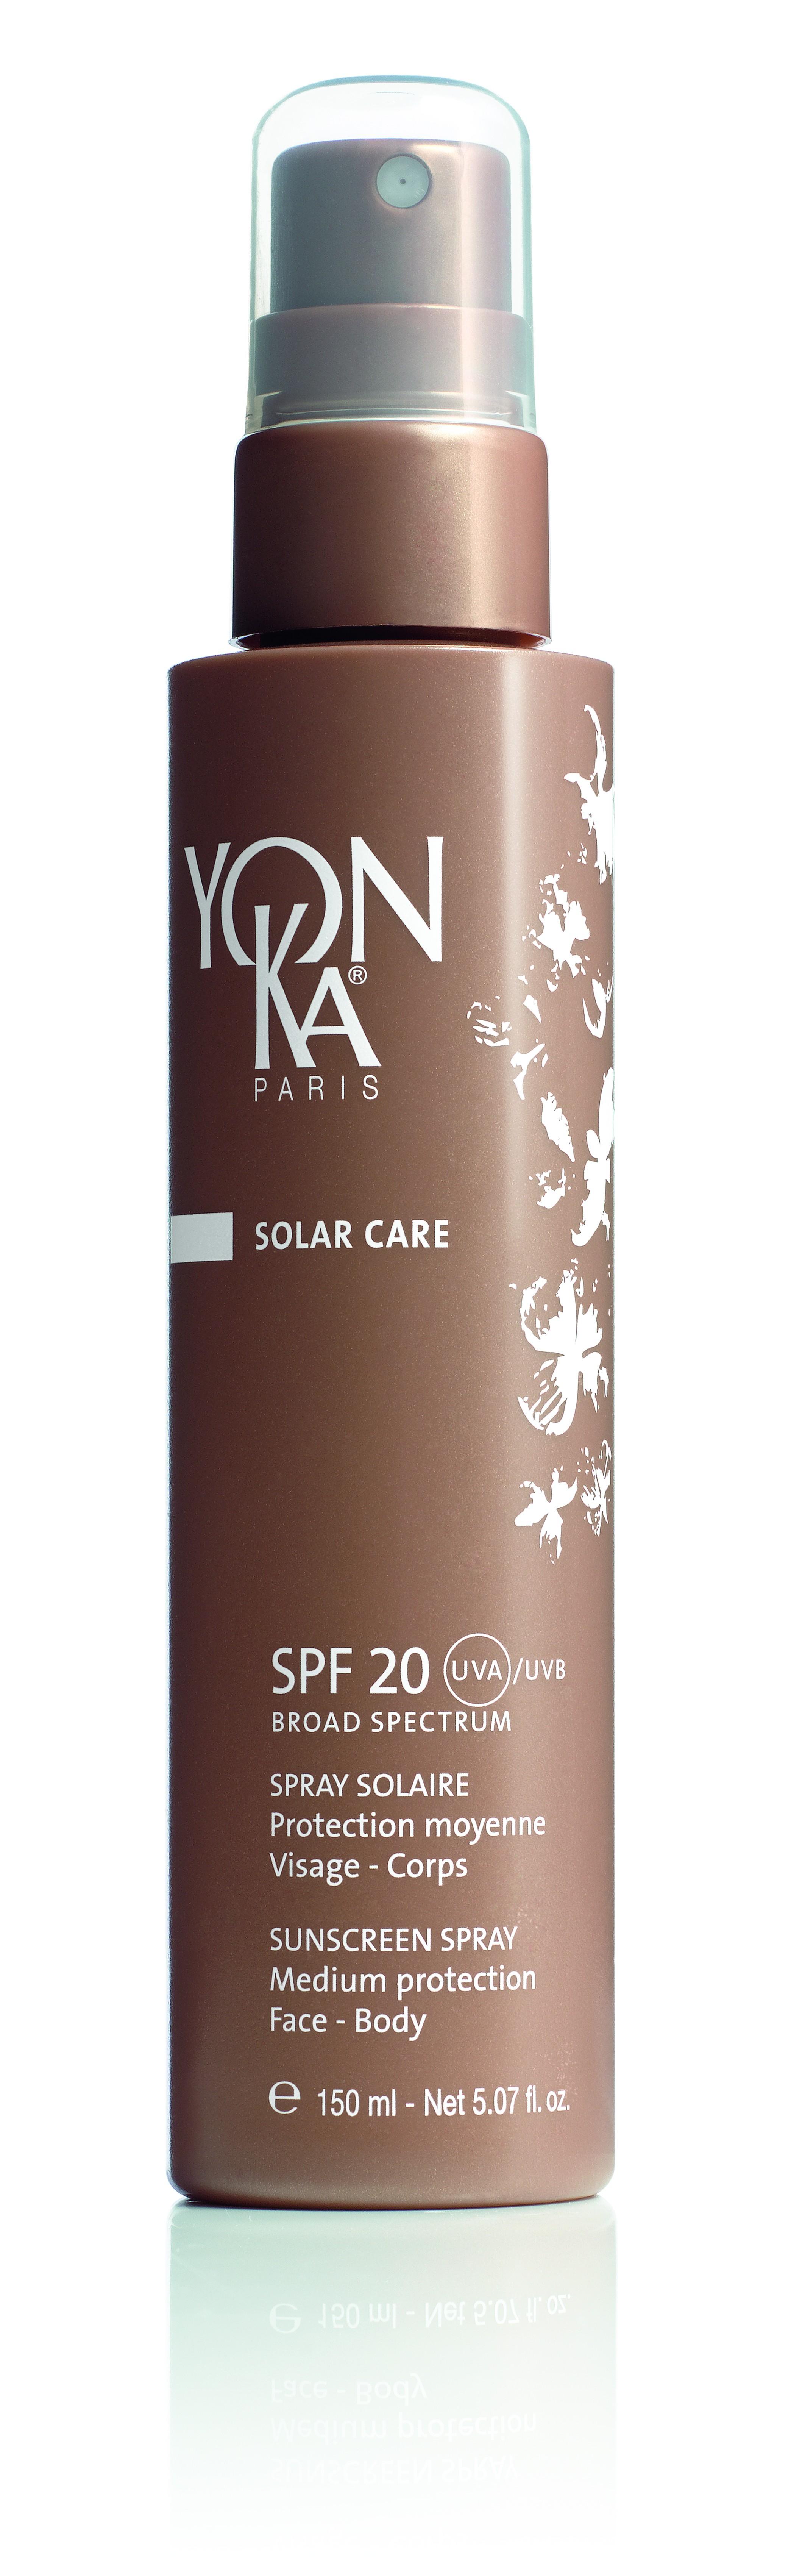 YON KA Спрей для защиты от солнца SPF20 / SOLAR CARE 150мл